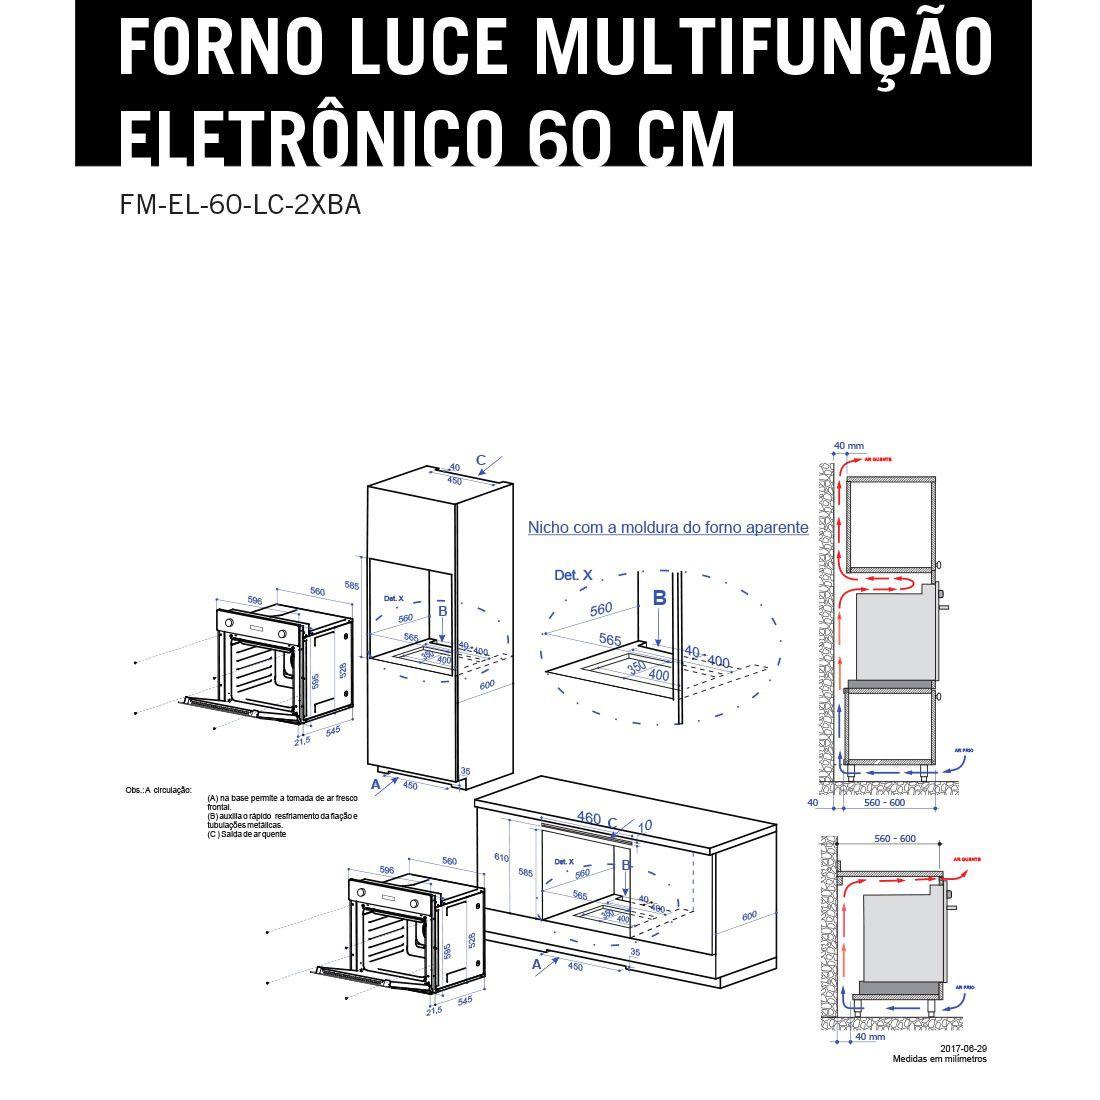 Forno Elettromec Elétrico Luce Multifunções Inox e Vidro 60cm 220V